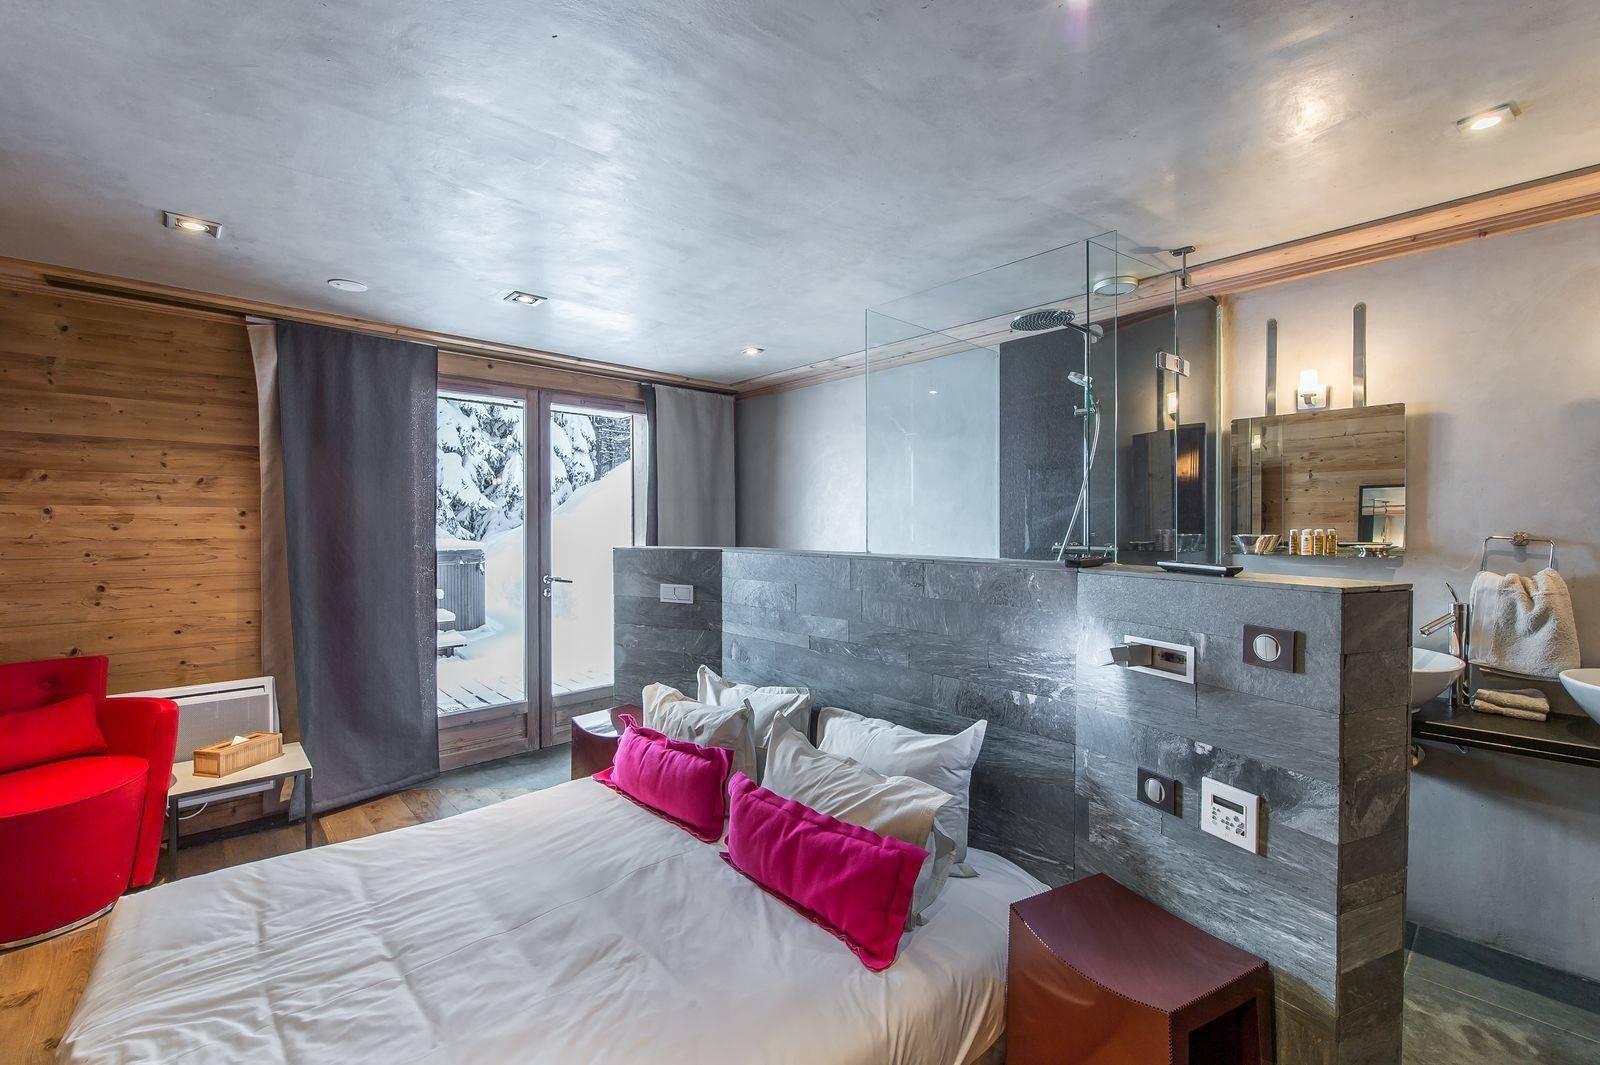 Courchevel 1850 Location Chalet Luxe Nigrine Chambre 3